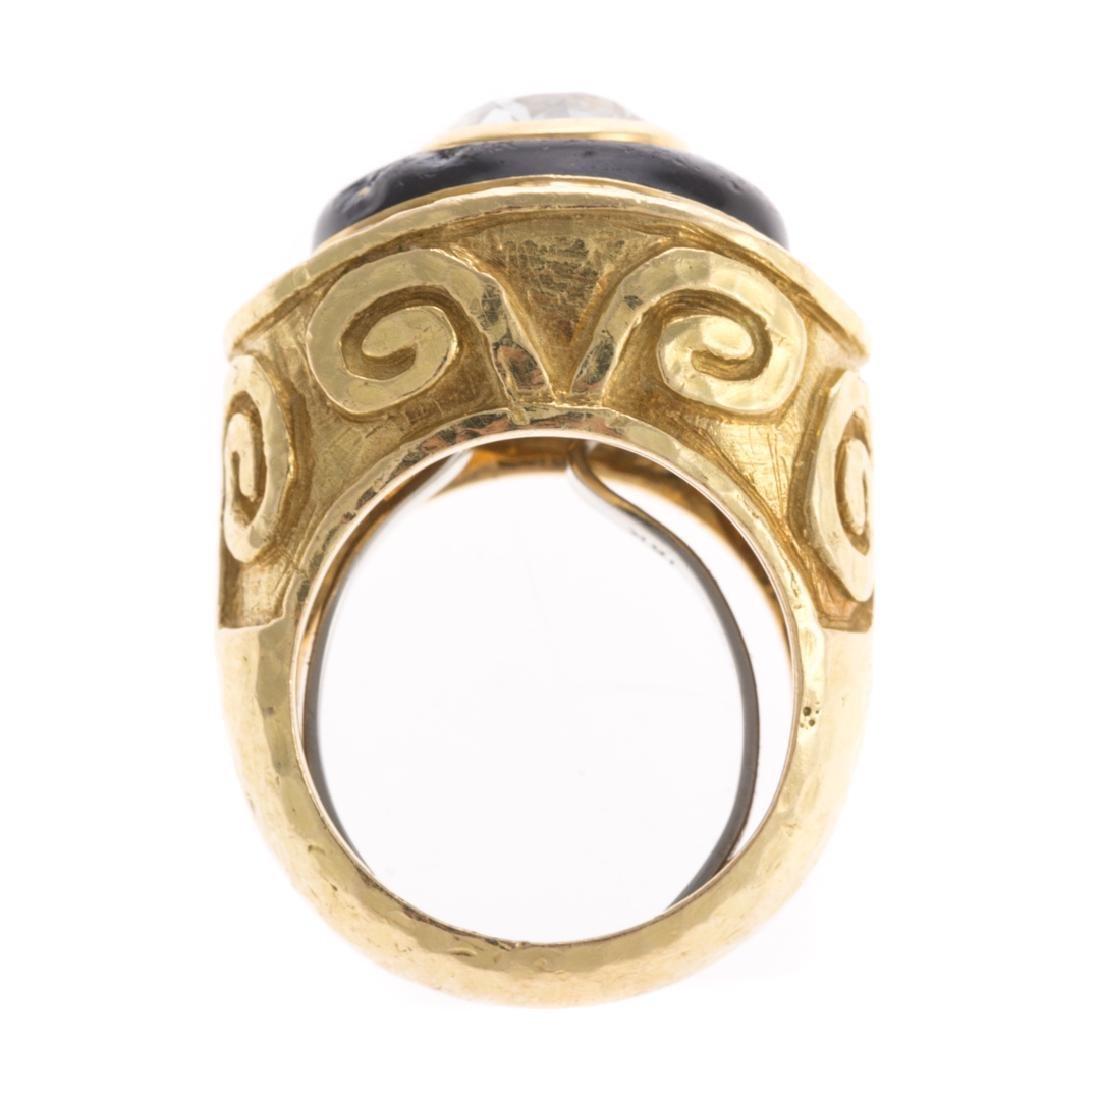 A 18K Diamond Ring & Enamel by David Webb - 5